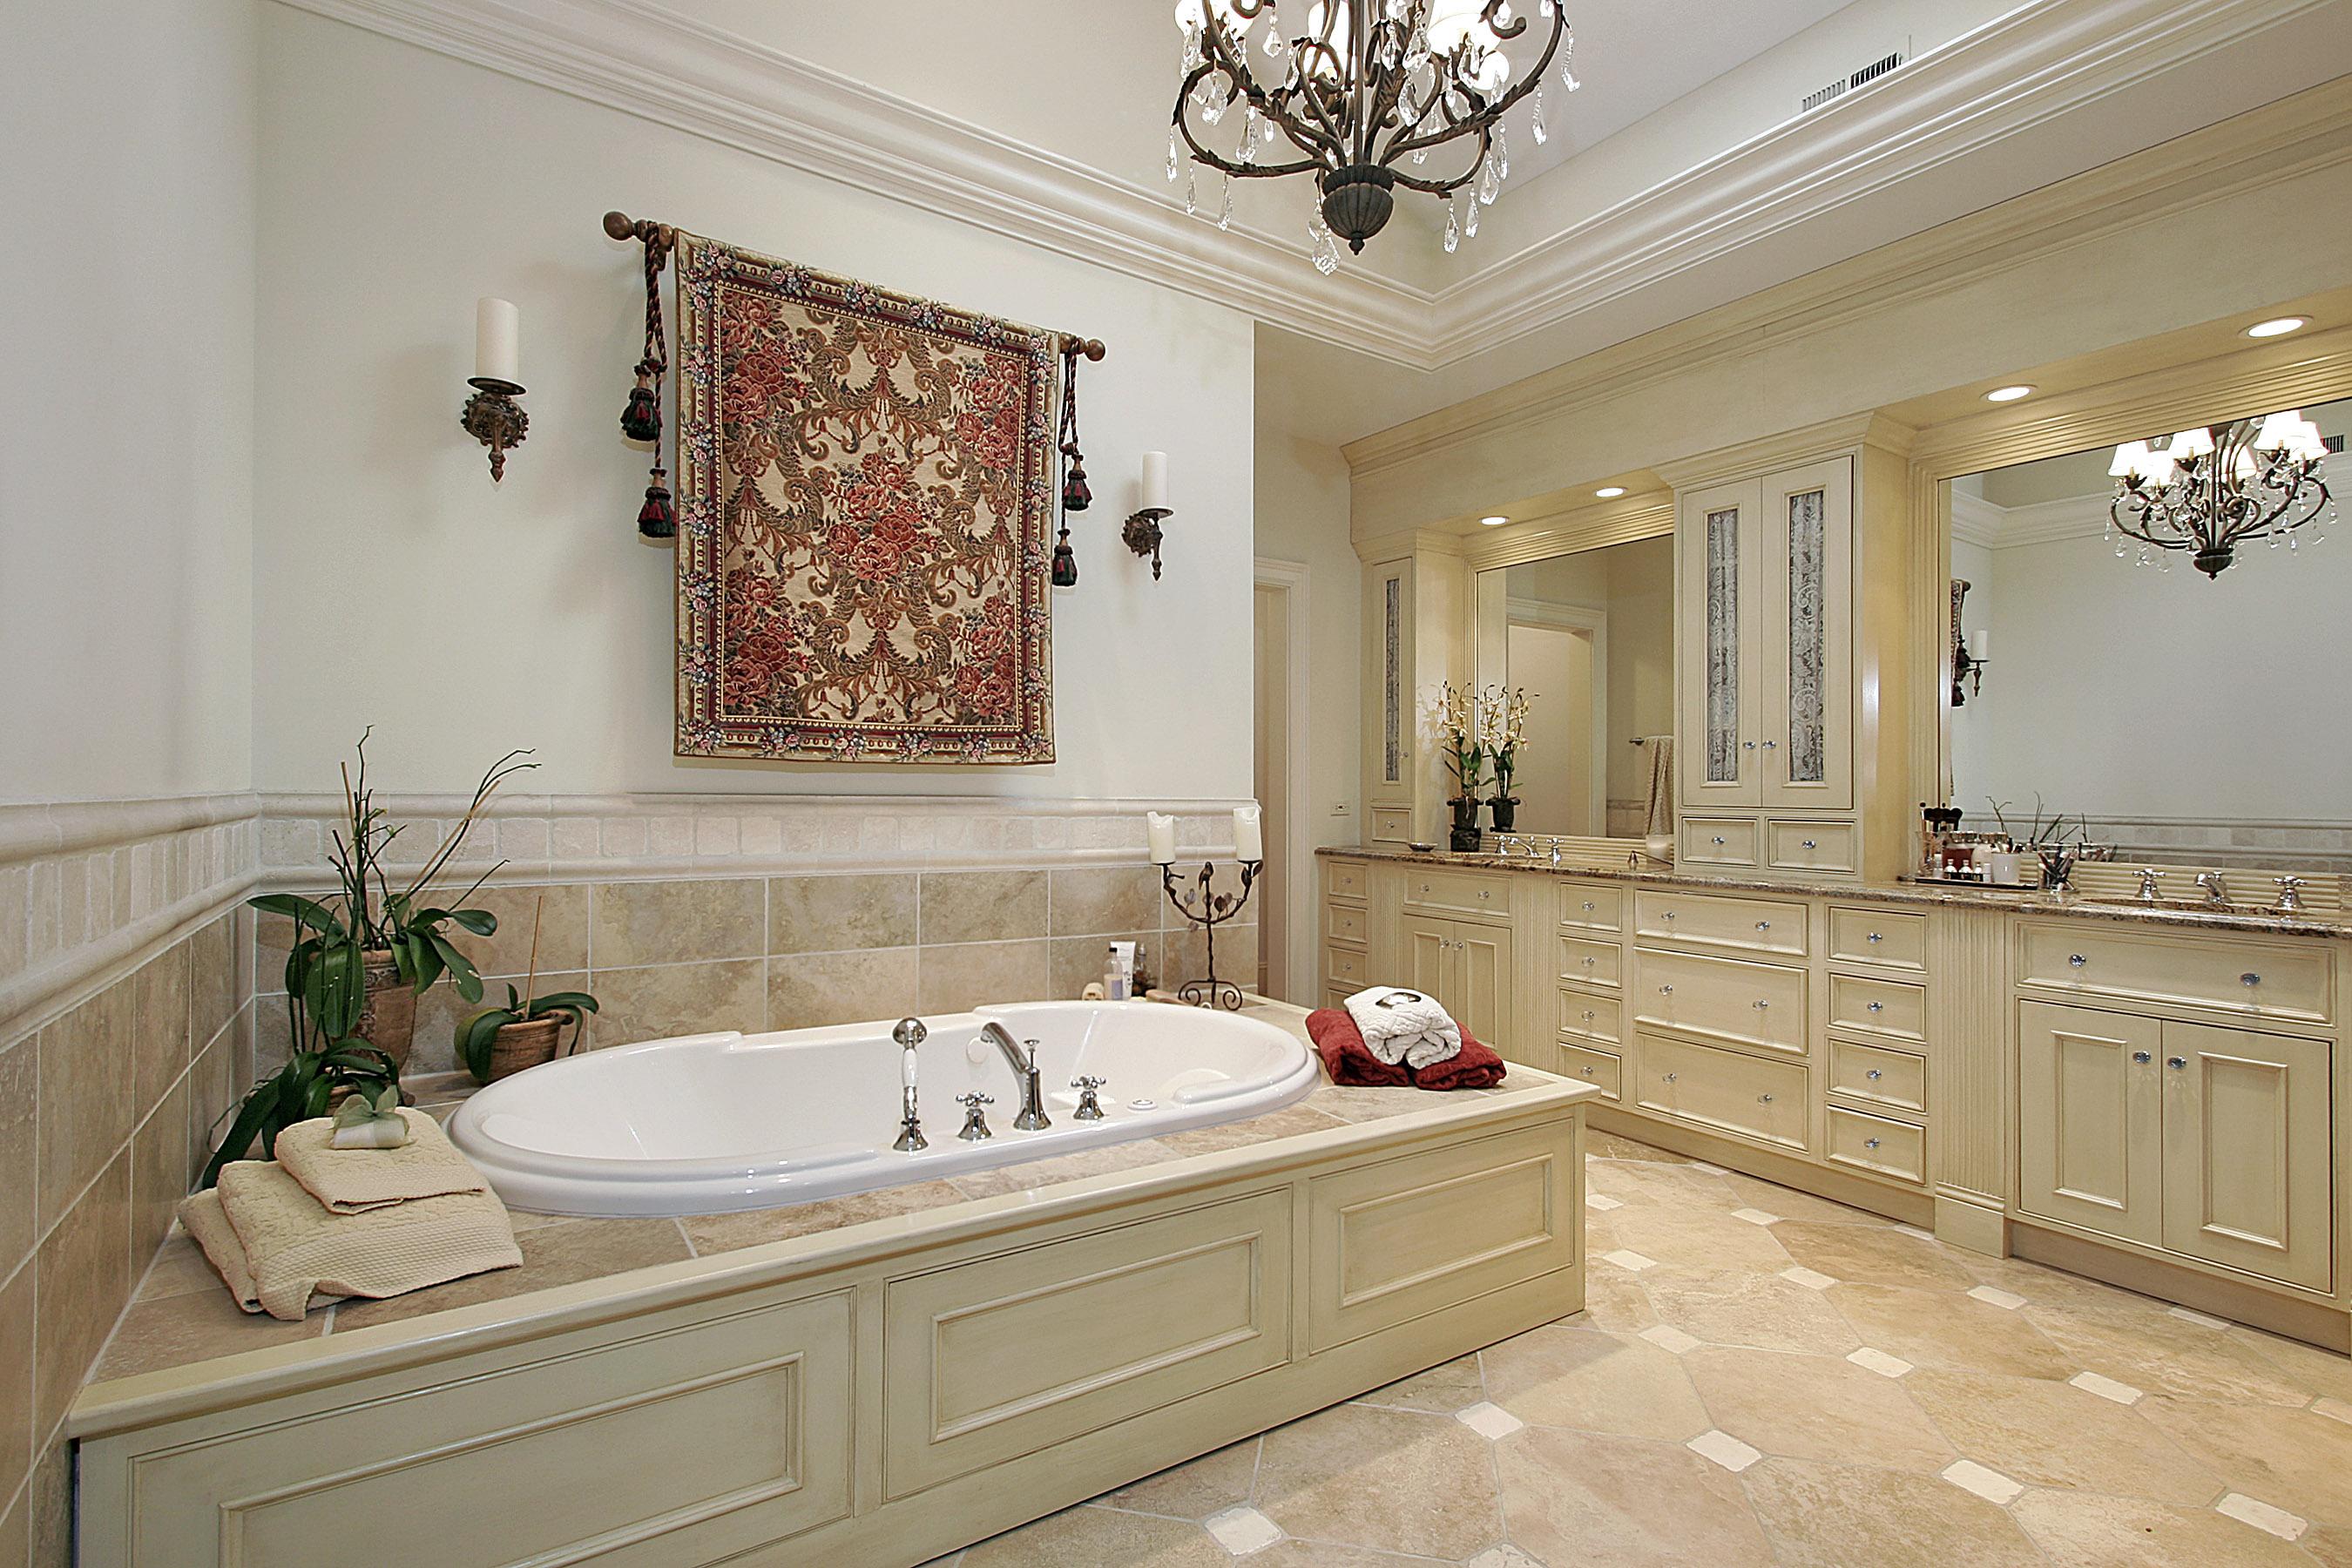 bigstock-Master-Bath-In-Luxury-Home-5147904